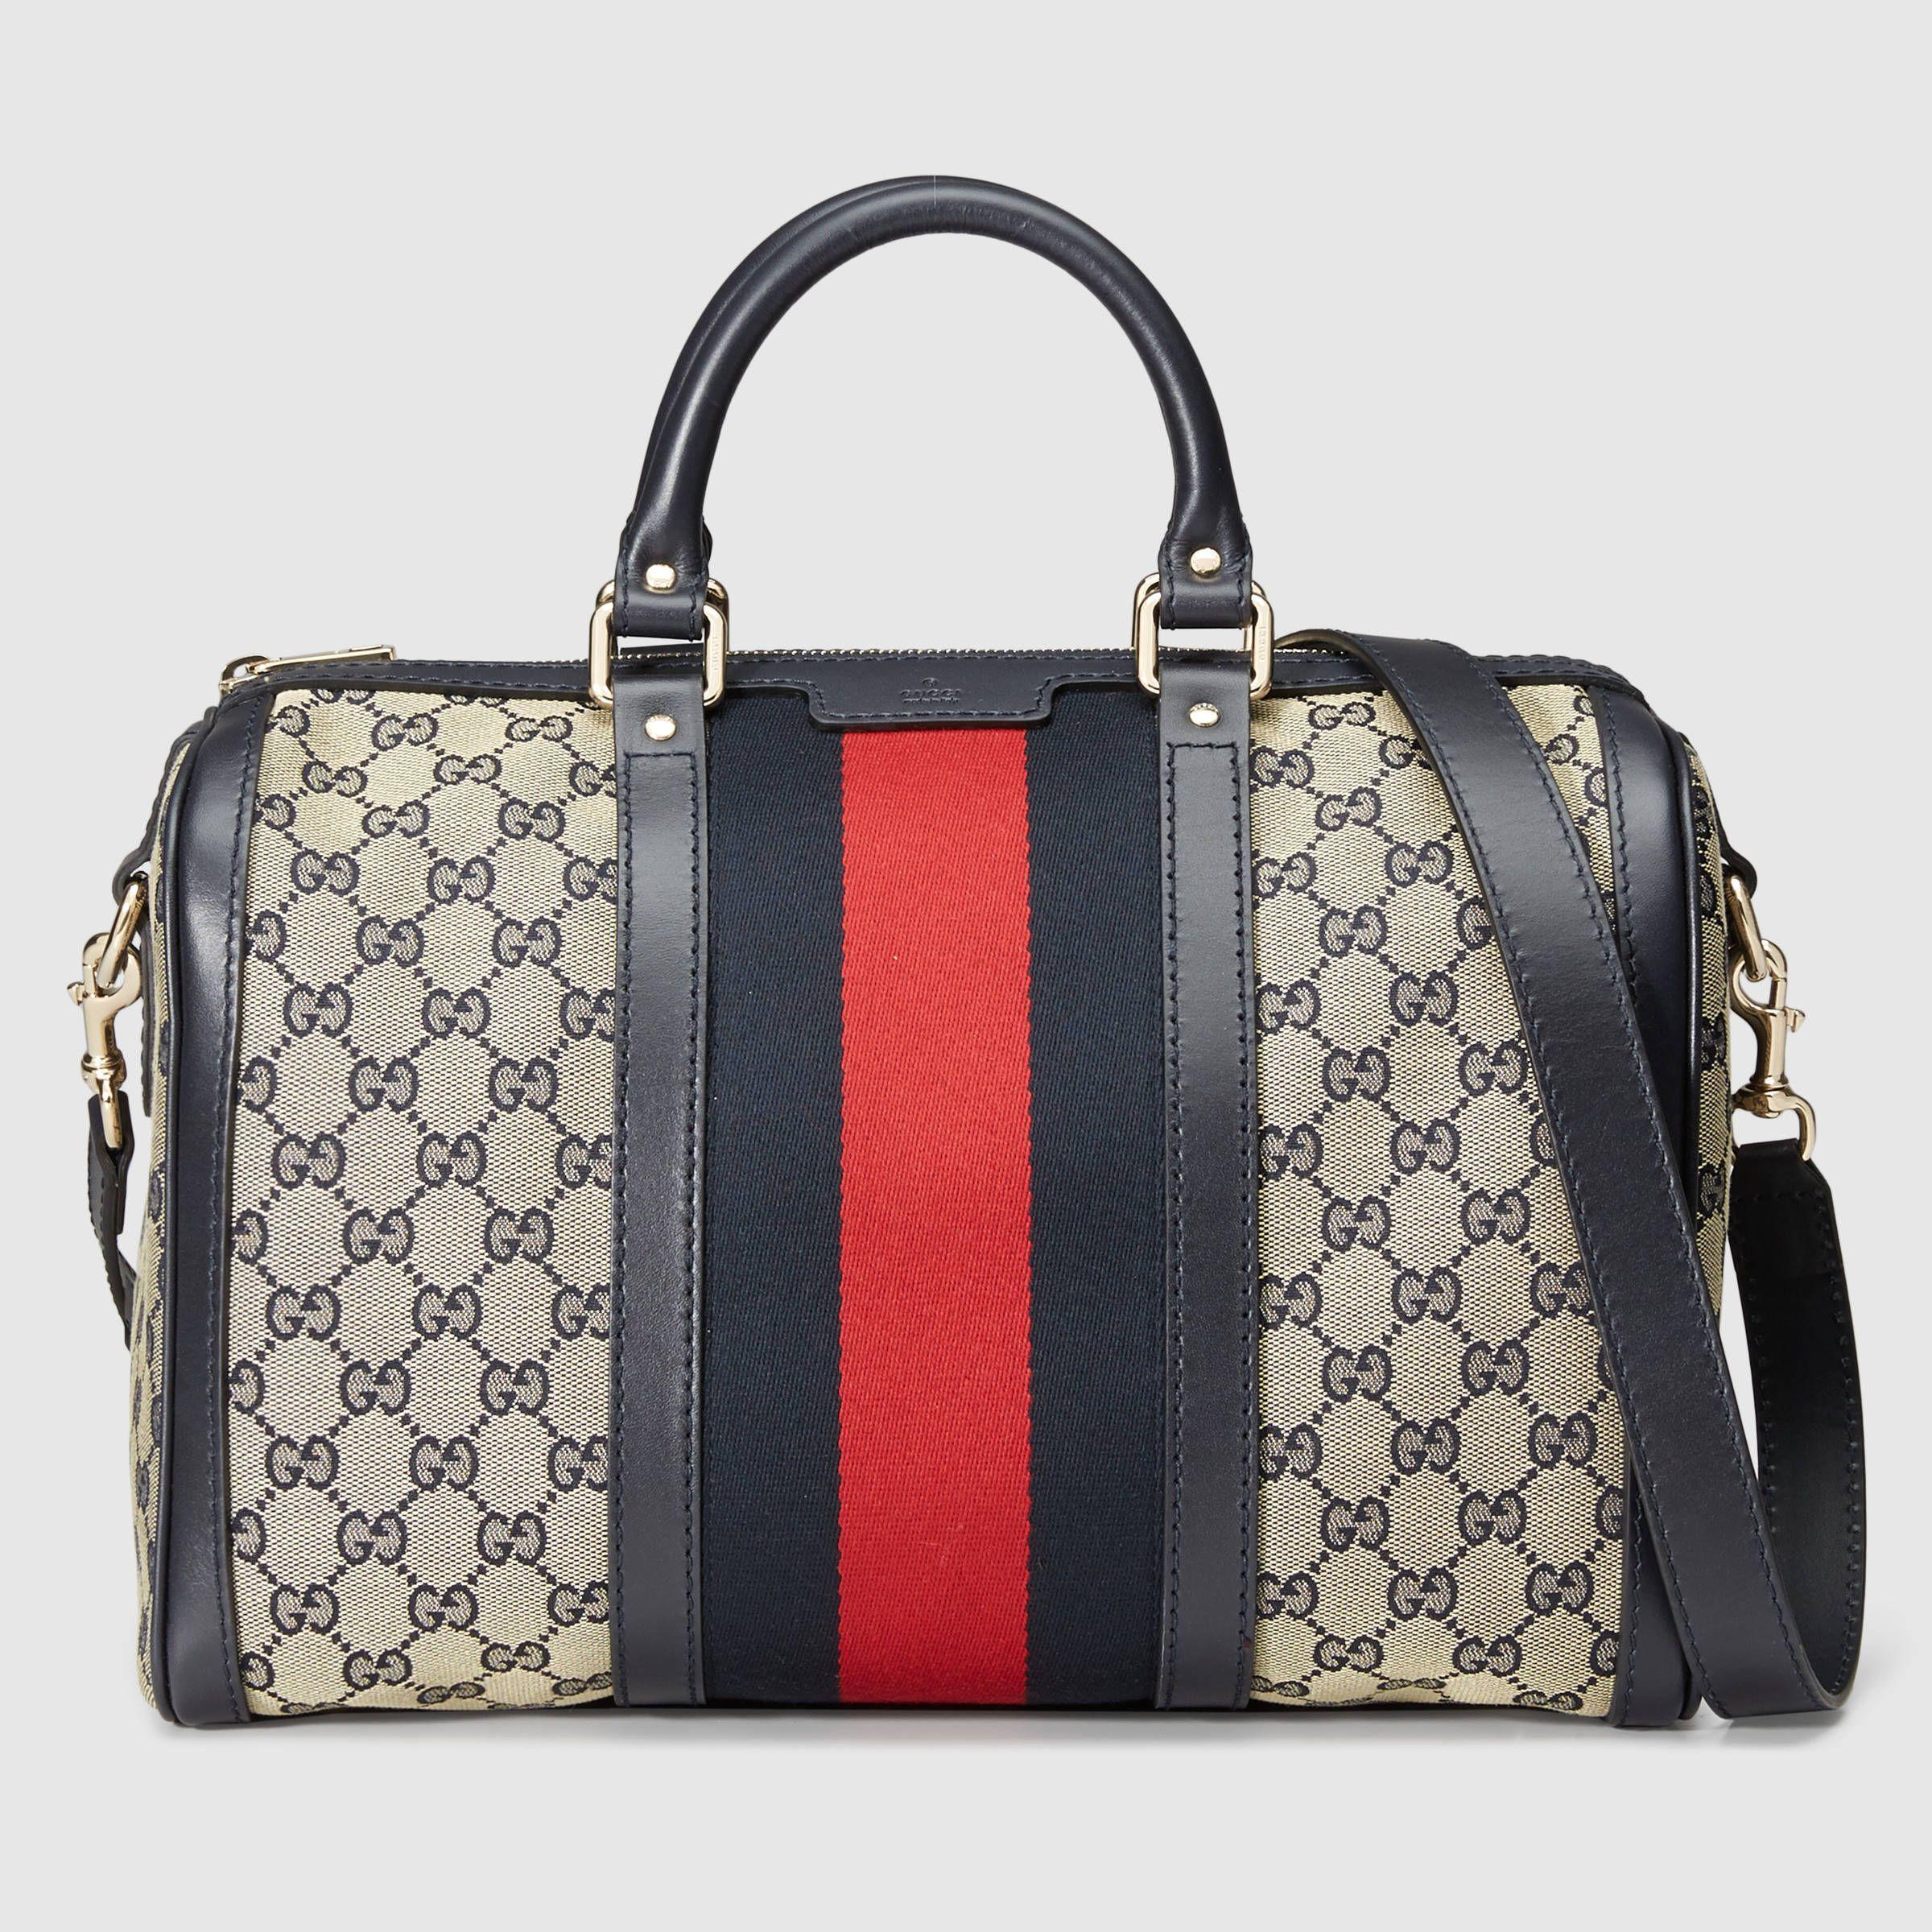 94803320b6b Gucci Vintage Web Original GG boston bag  1